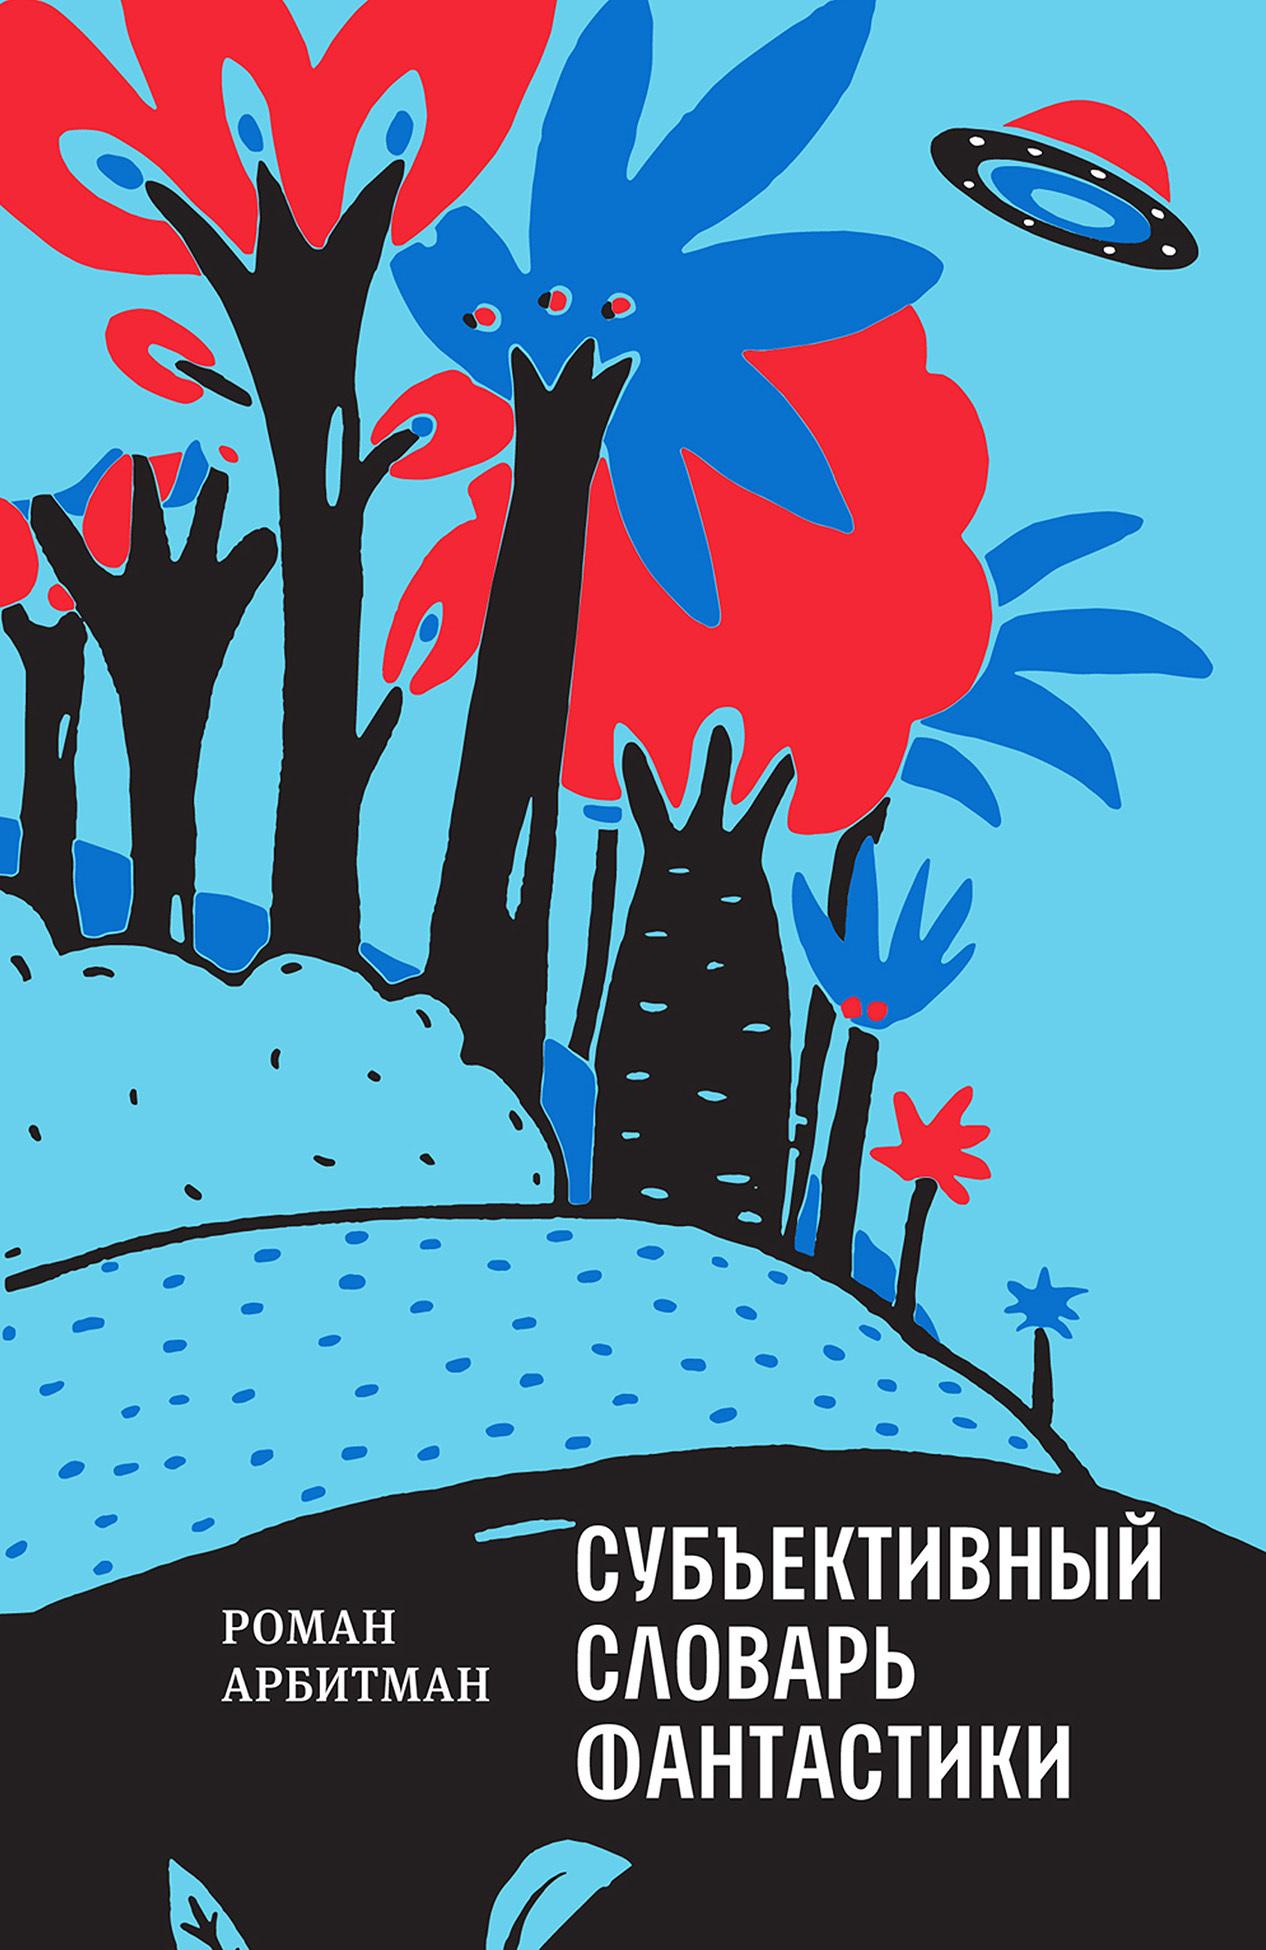 Роман Арбитман Субъективный словарь фантастики